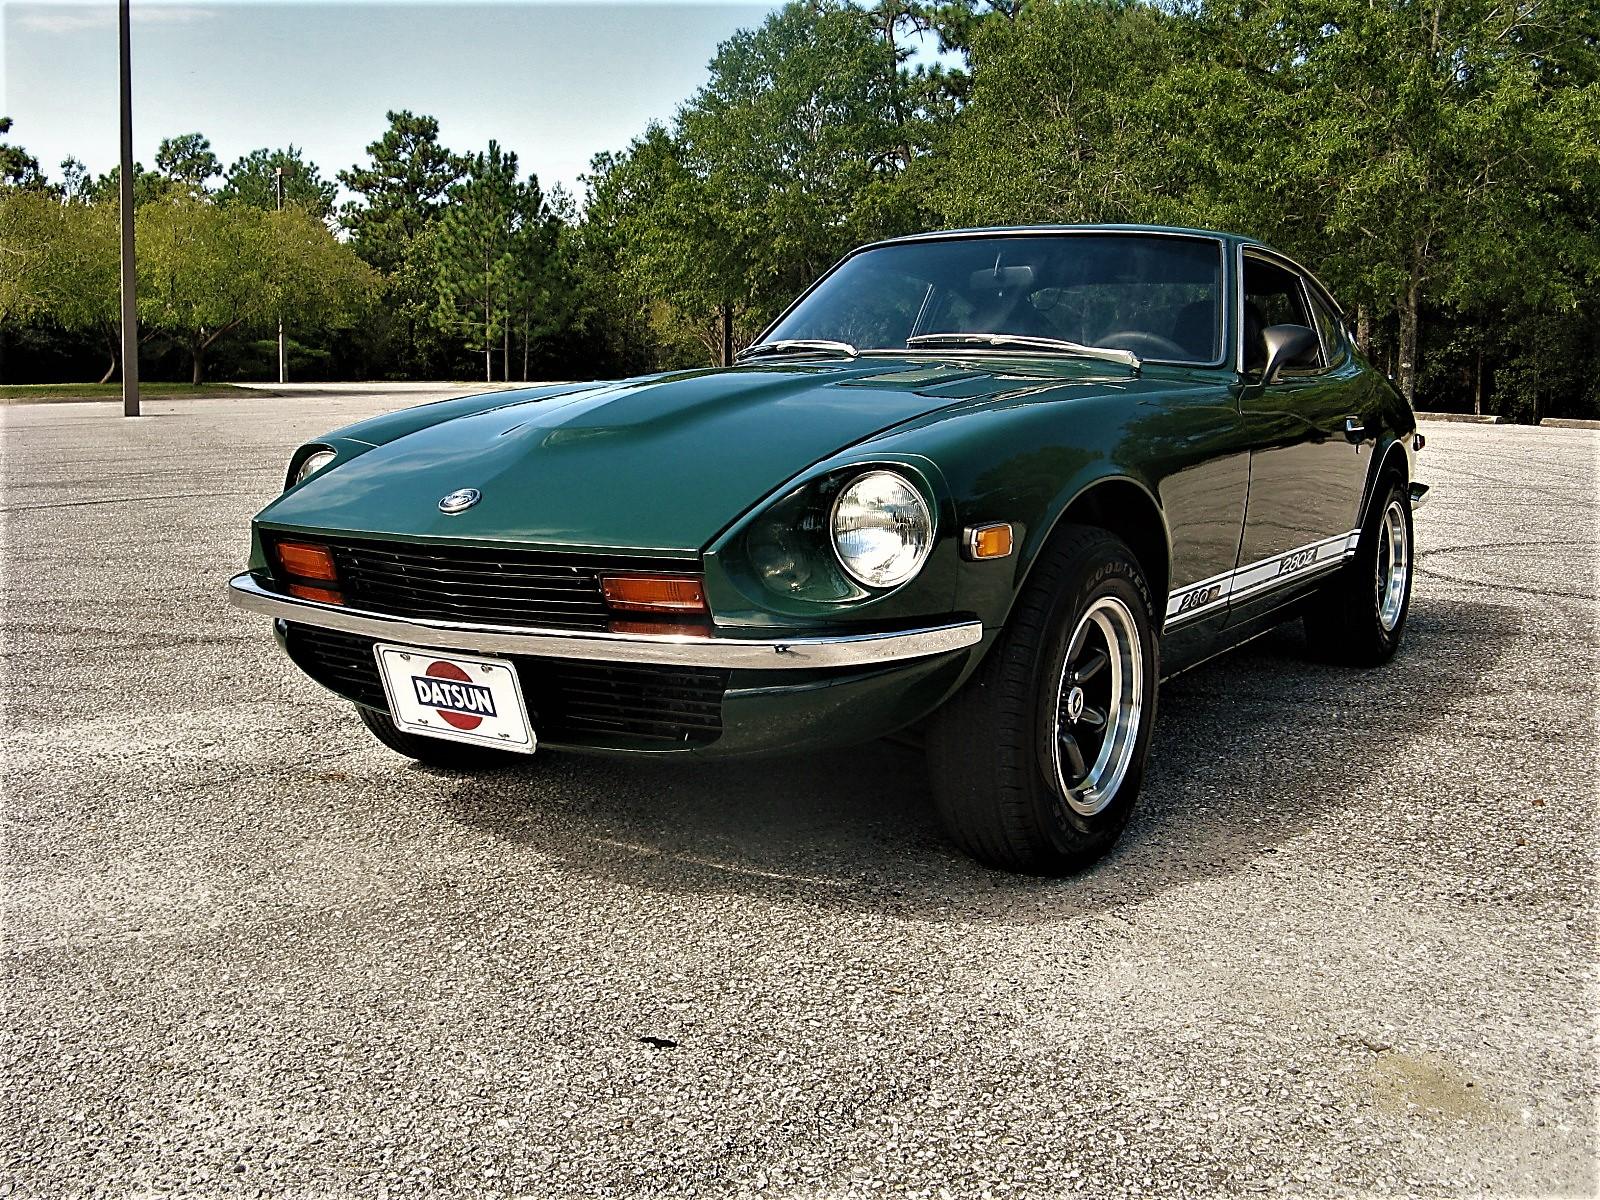 Https Atlanta Craigslist Org Atl Cto D Classic Car For Sale  Html